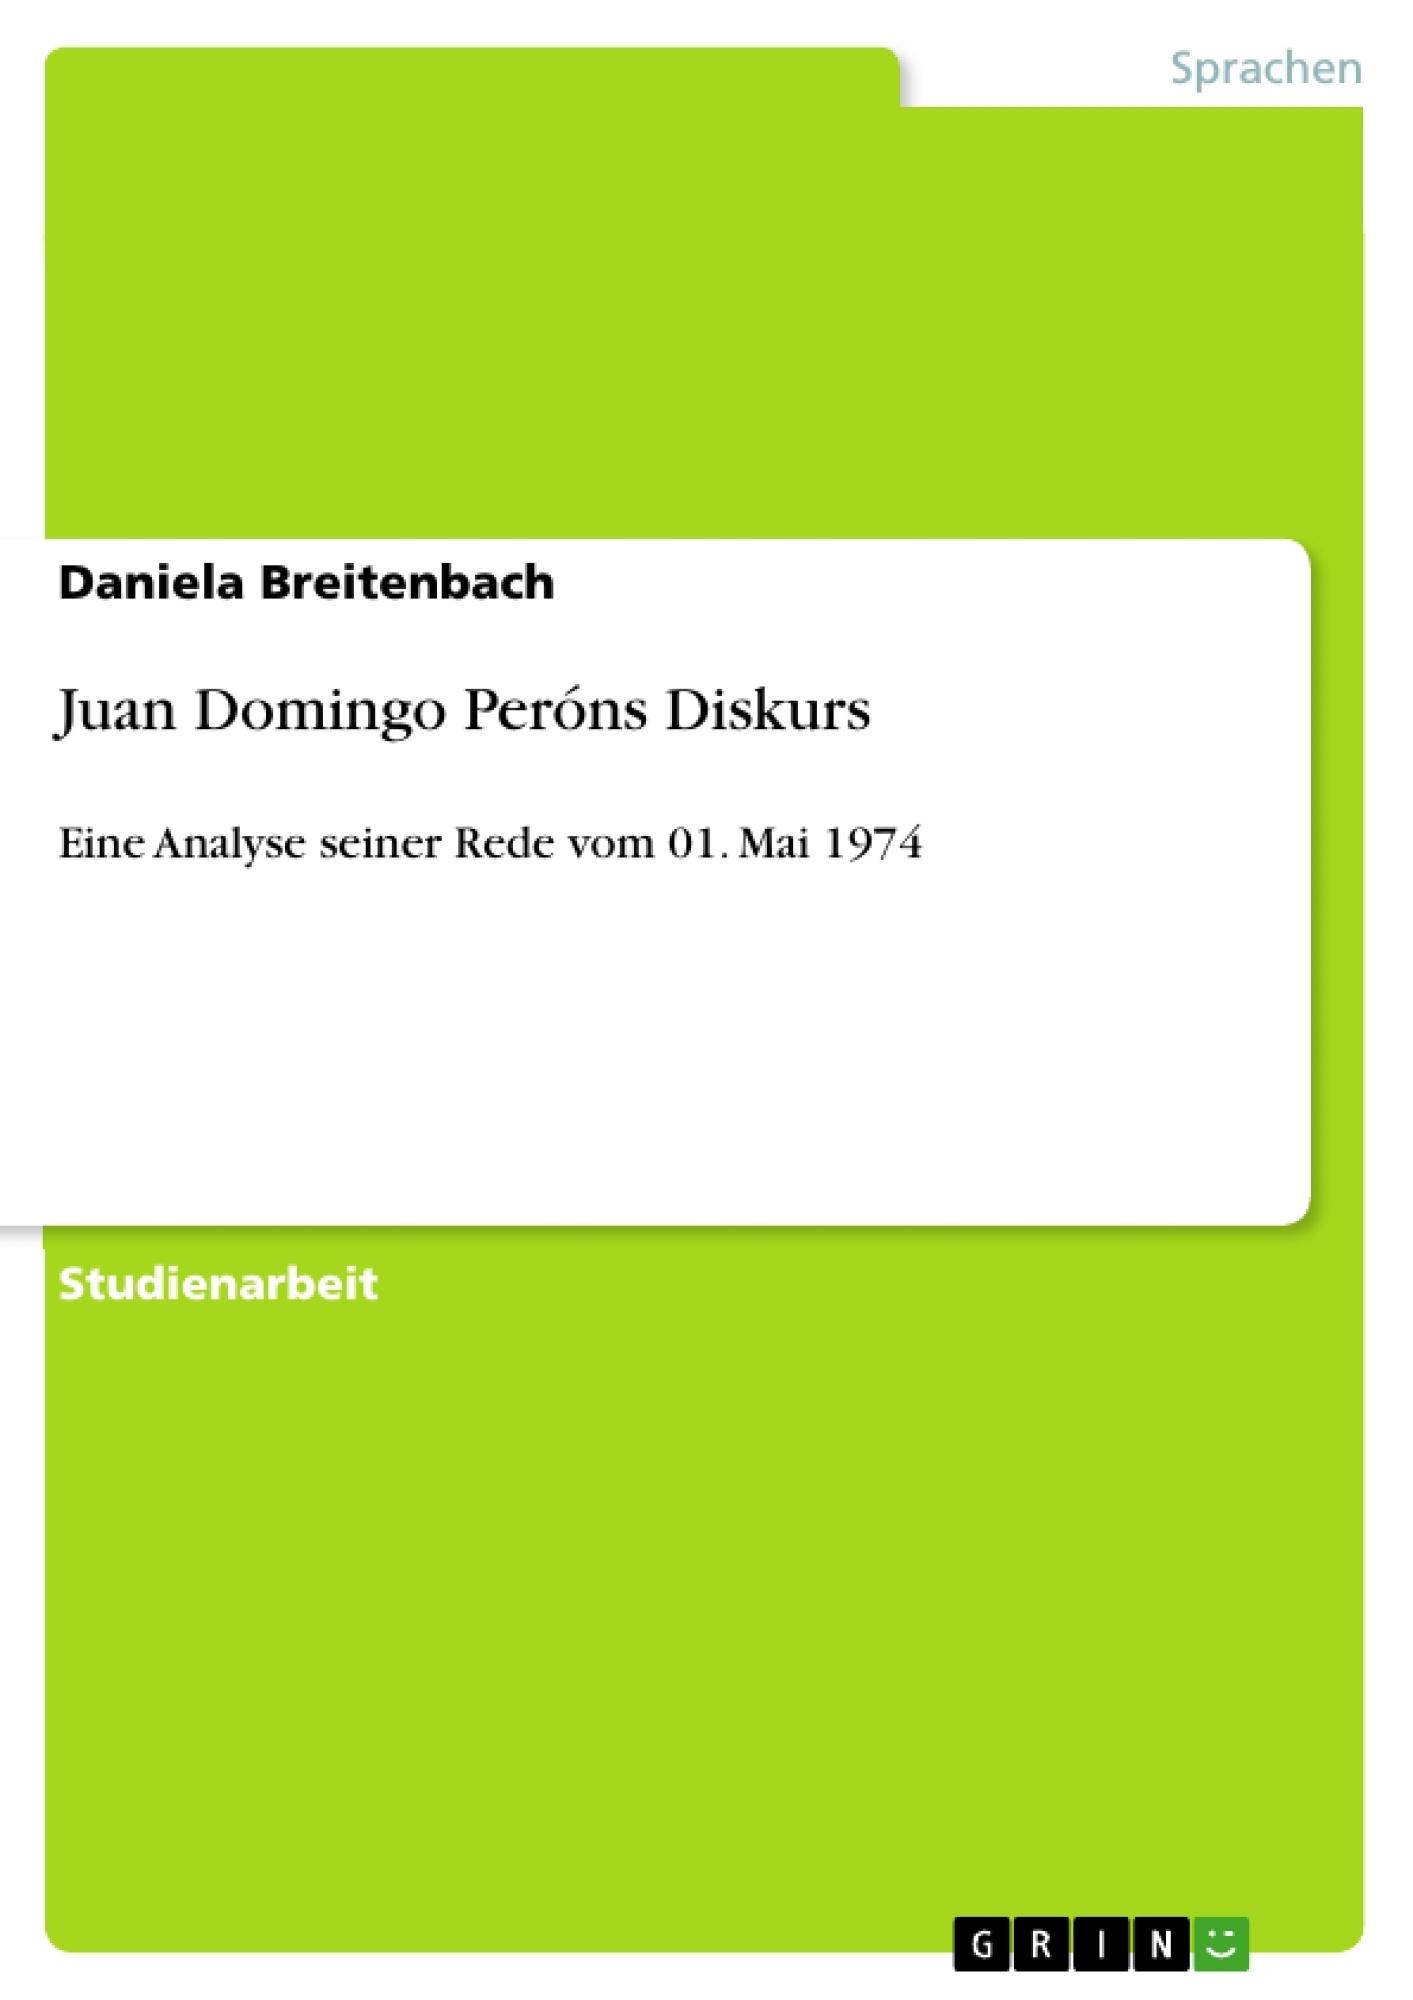 Titel: Juan Domingo Peróns Diskurs